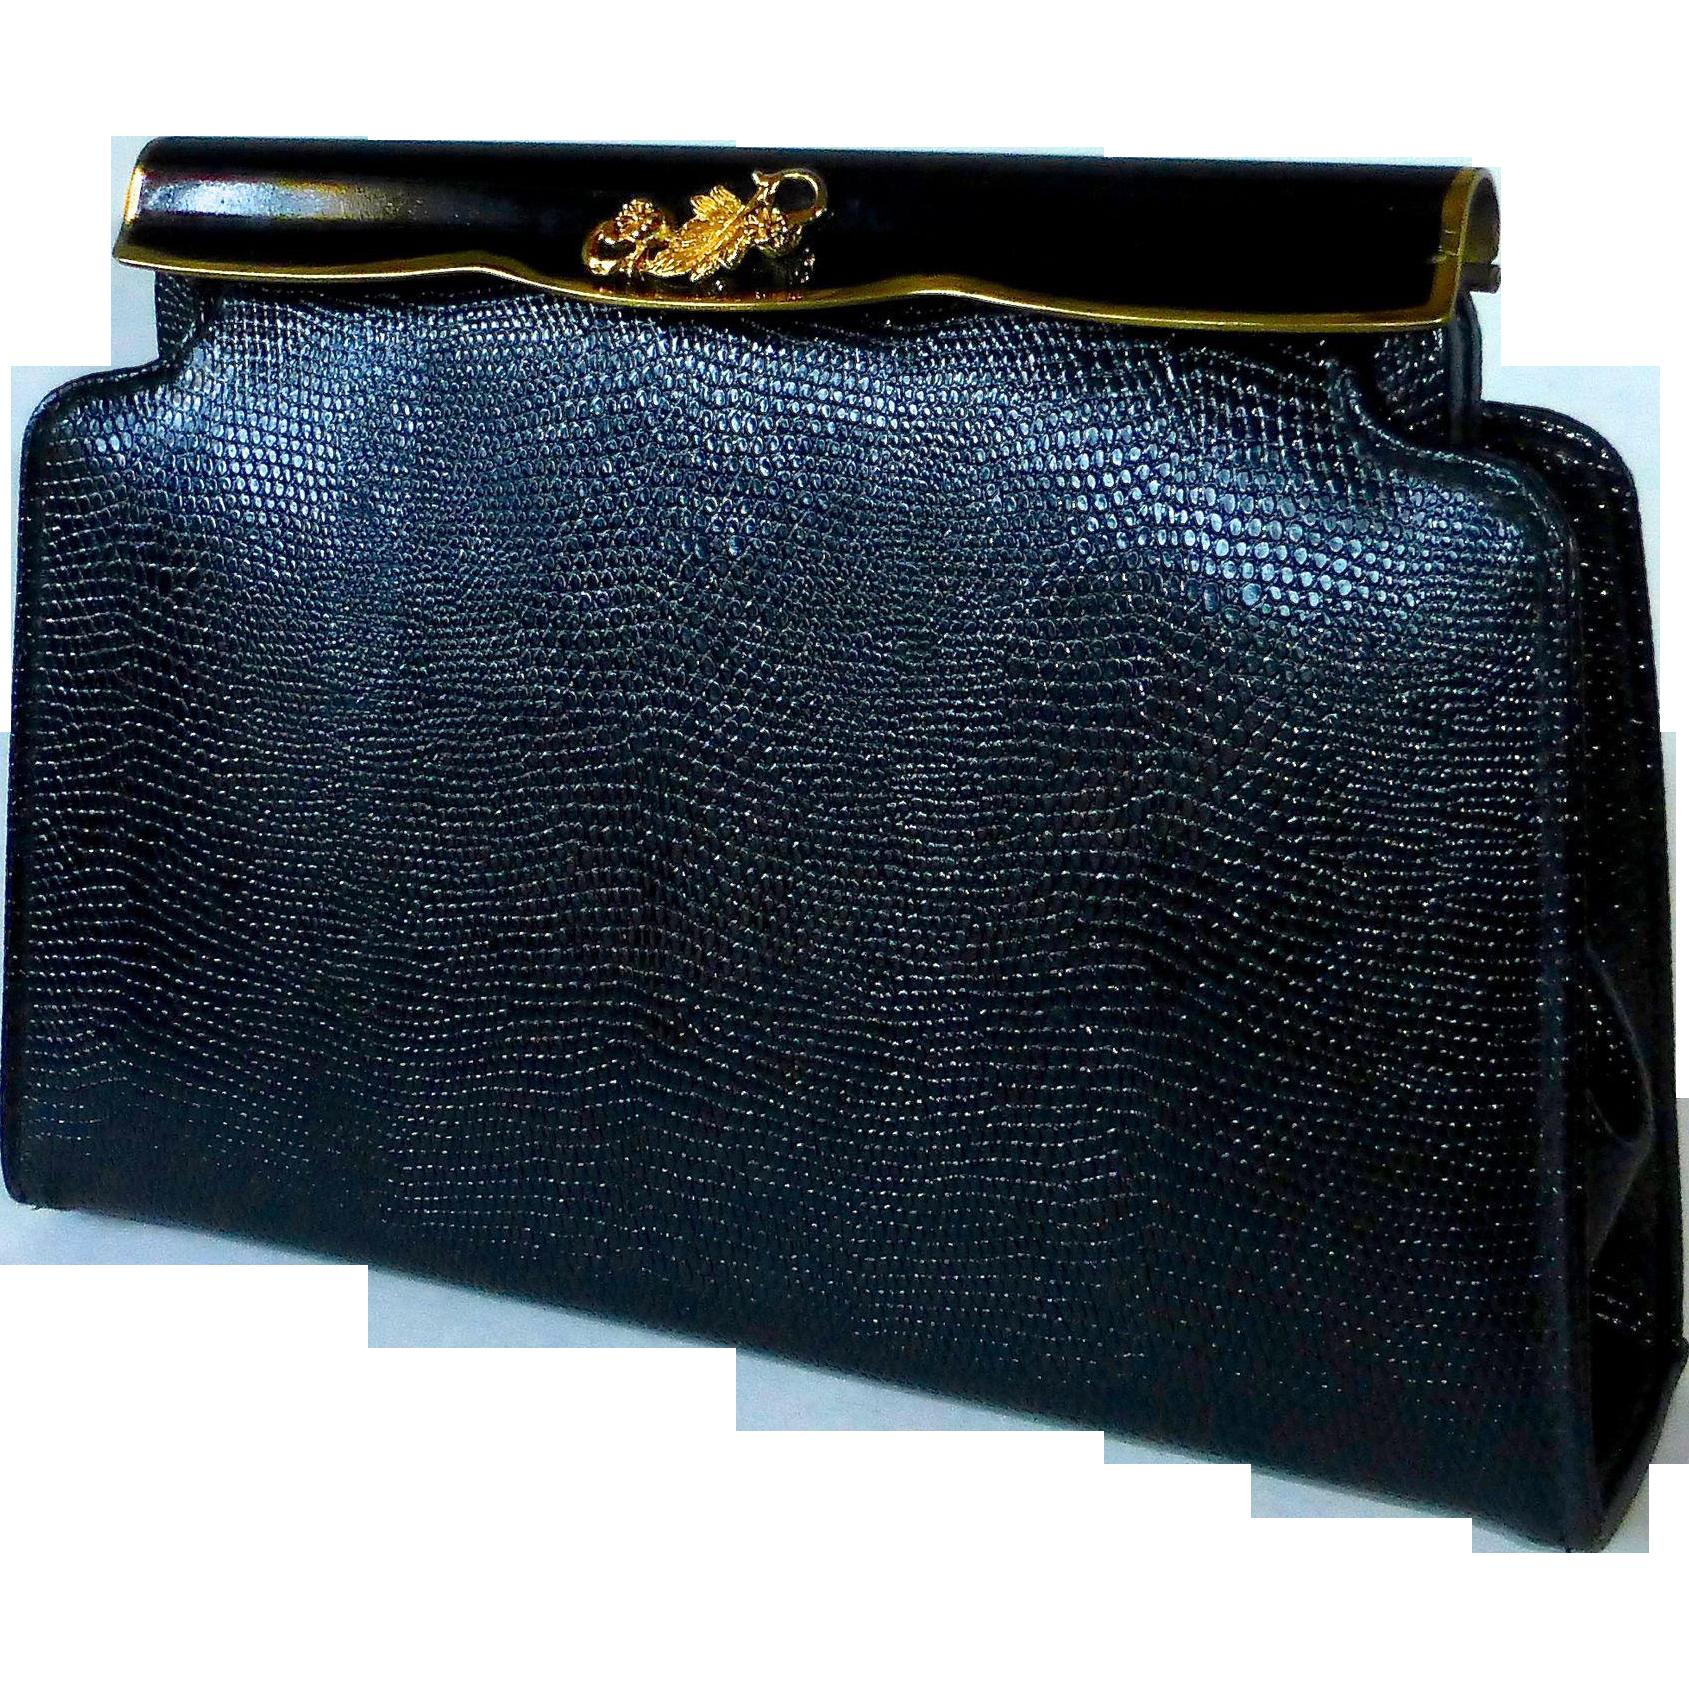 Fine Quality Lizard All Leather Clutch Purse Enamel Frame